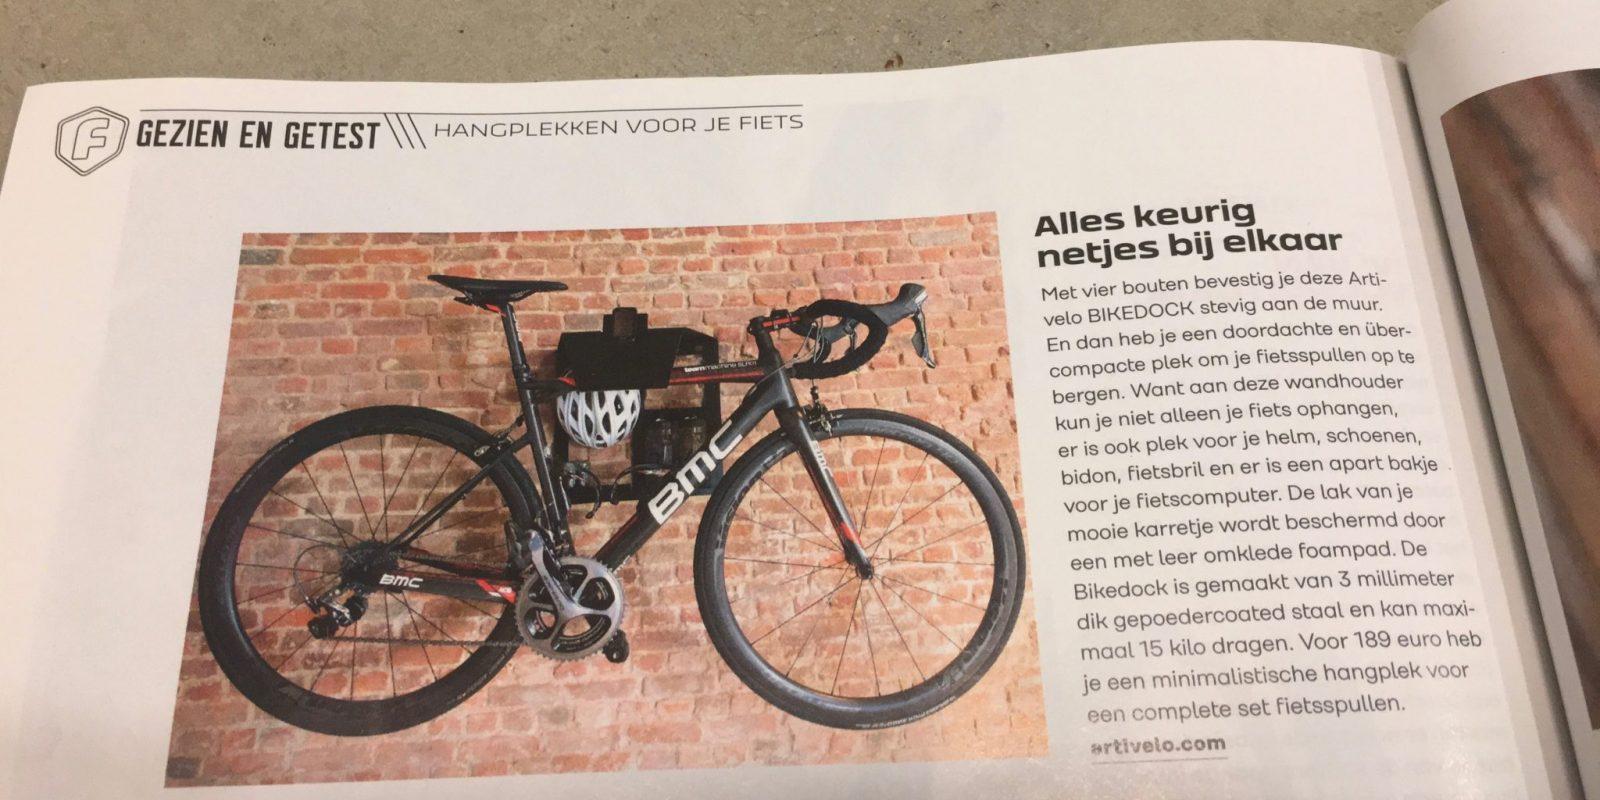 Fiets magazine test de Artivelo BikeDock